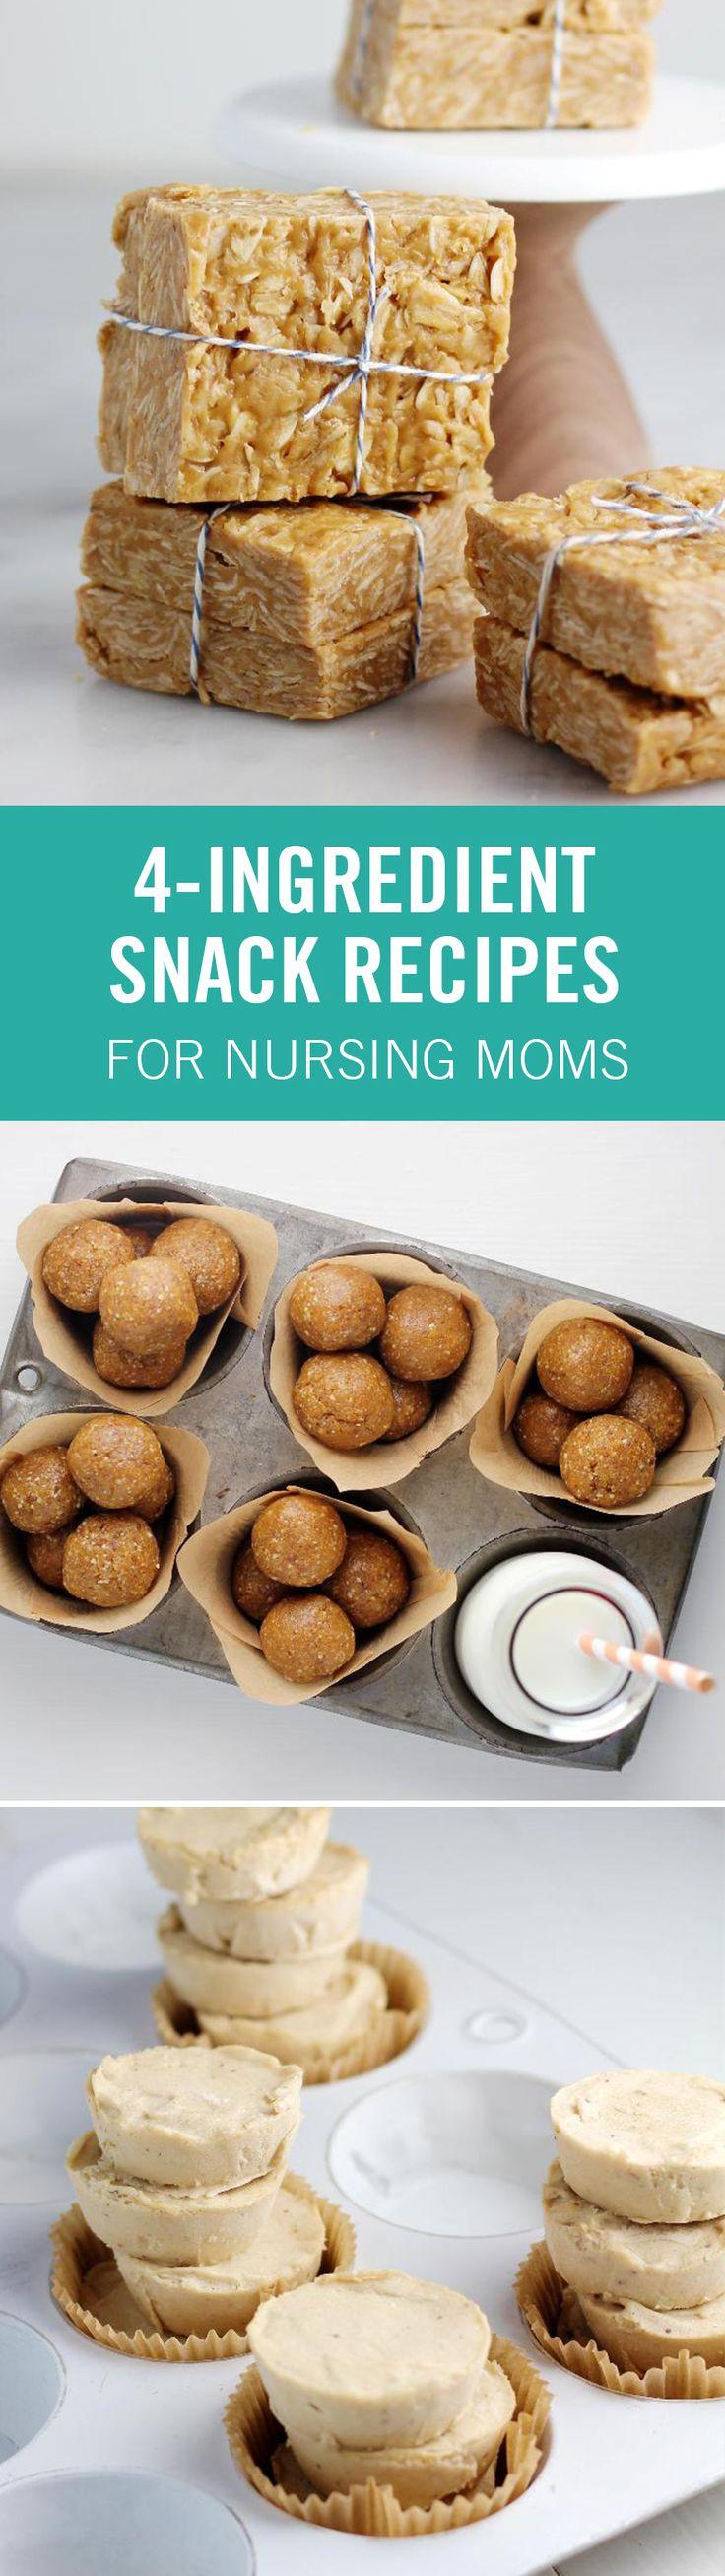 Healthy Snacks For Breastfeeding Moms  25 best ideas about Breastfeeding snacks on Pinterest